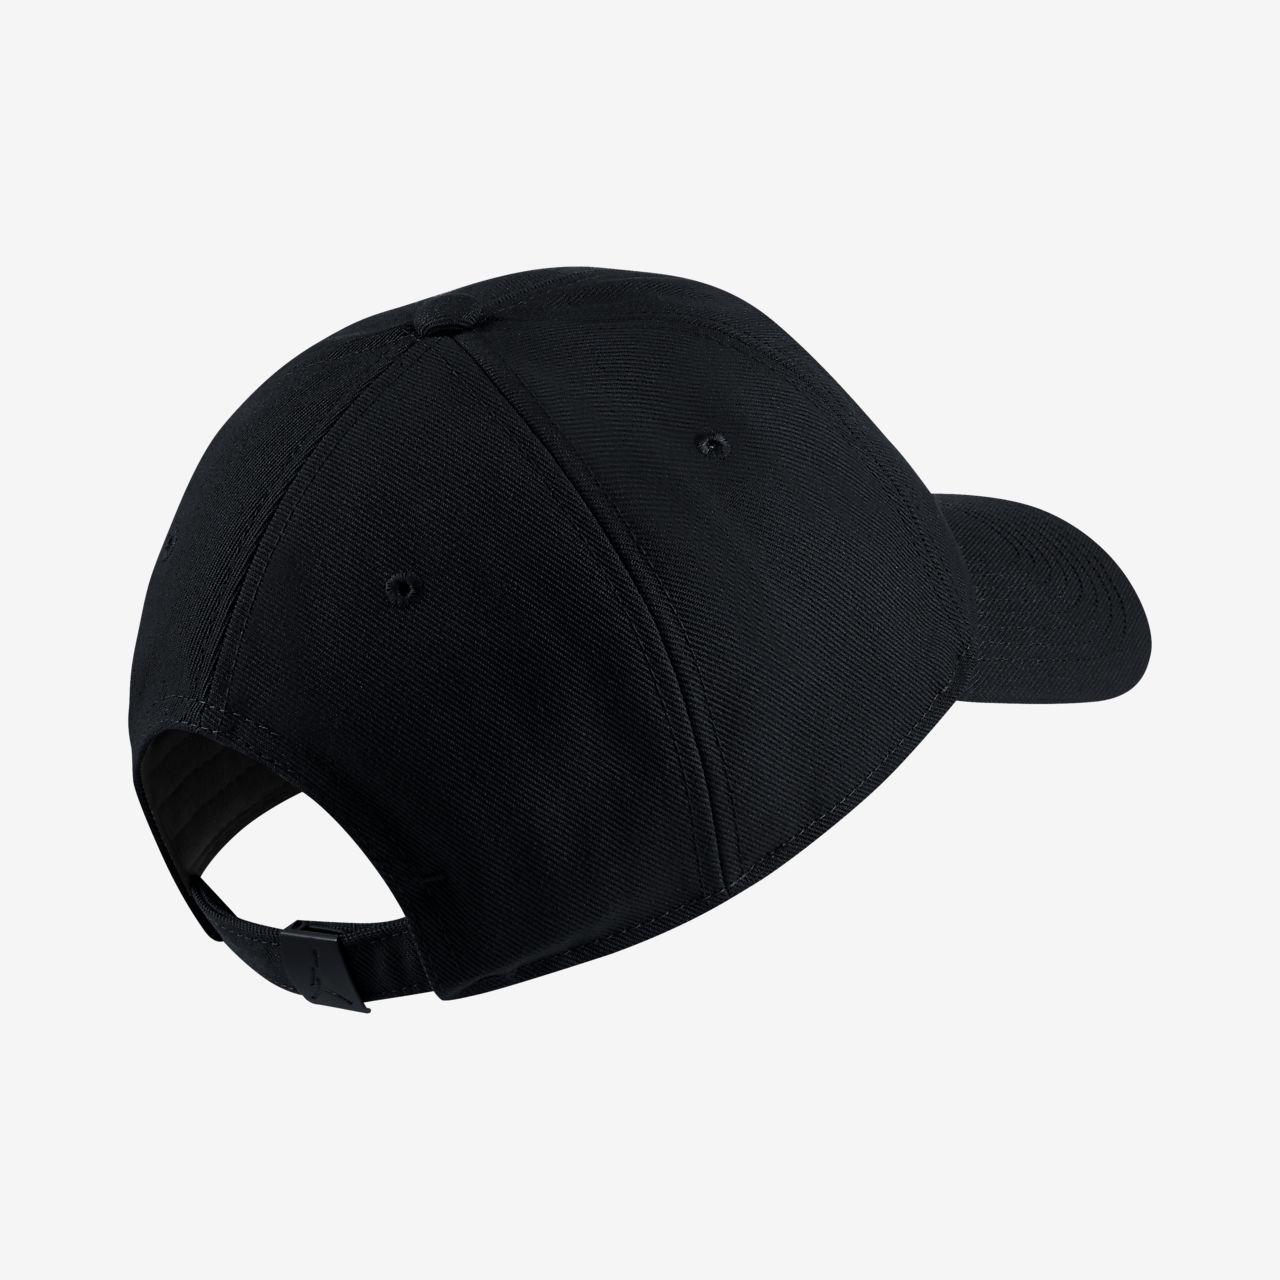 4cdc2ad66fb33e Low Resolution Jordan Jumpman H86 Adjustable Hat Jordan Jumpman H86  Adjustable Hat